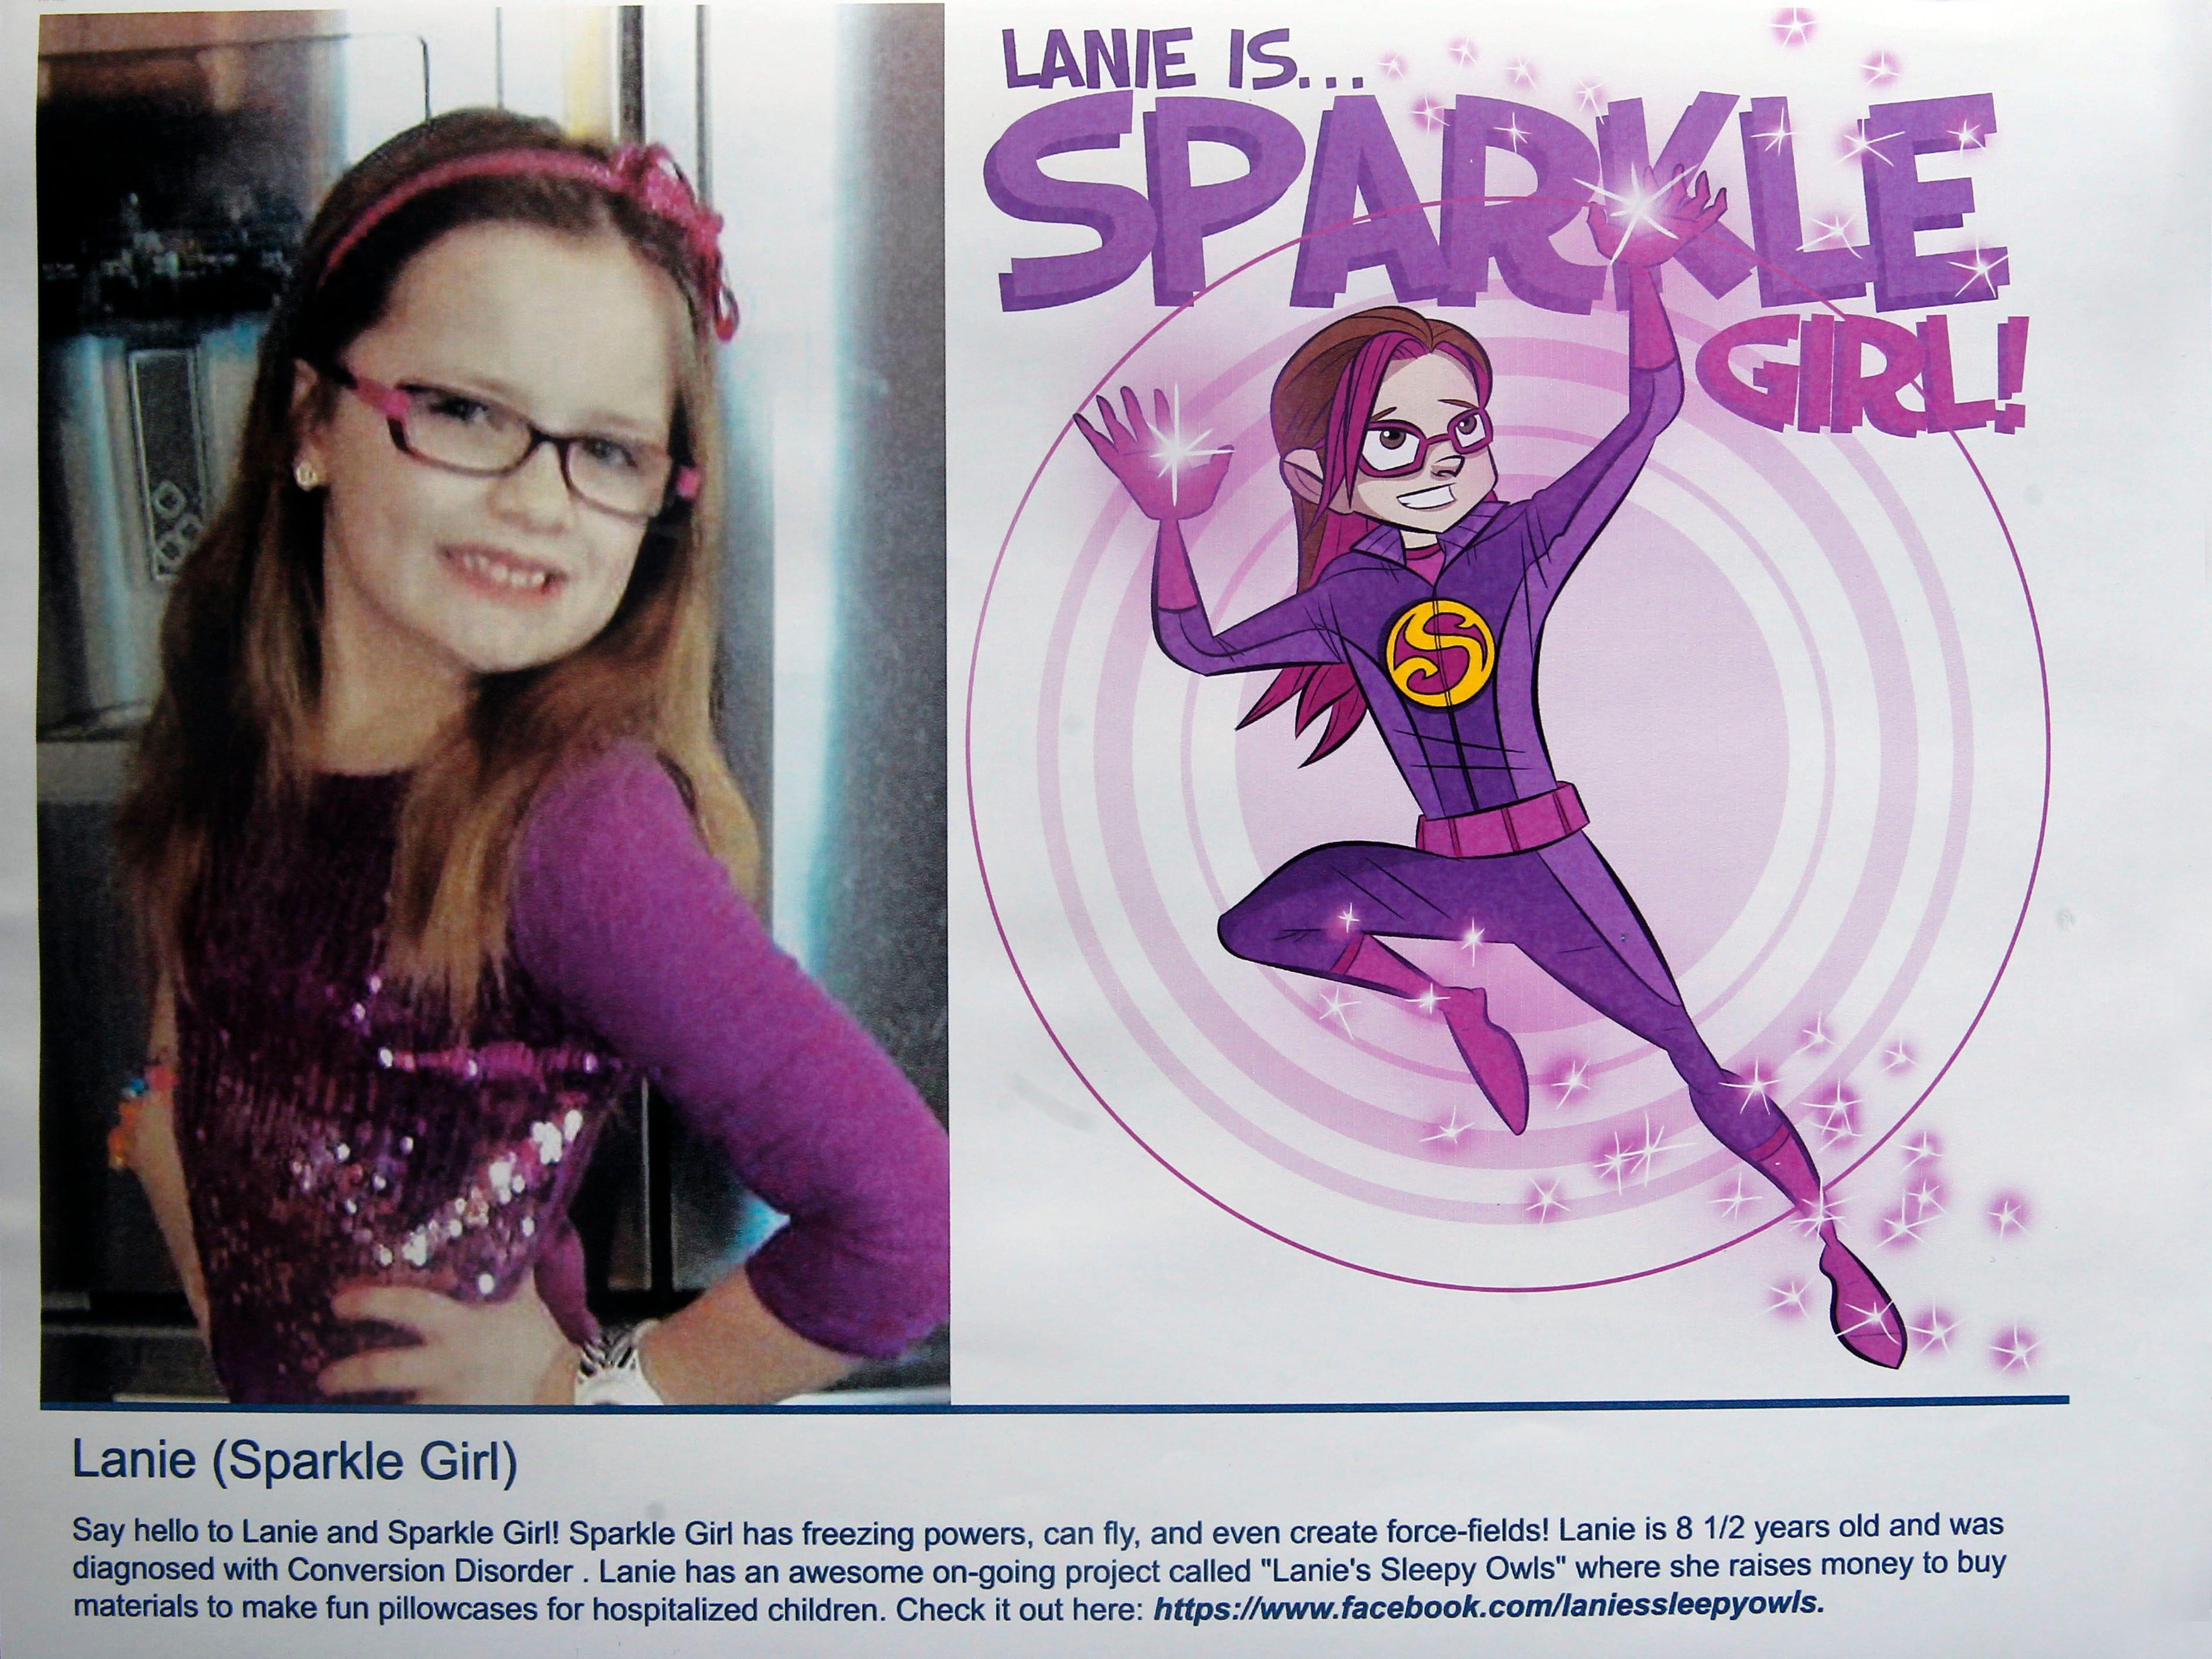 Lanie's superhero identity is Sparkle Girl.